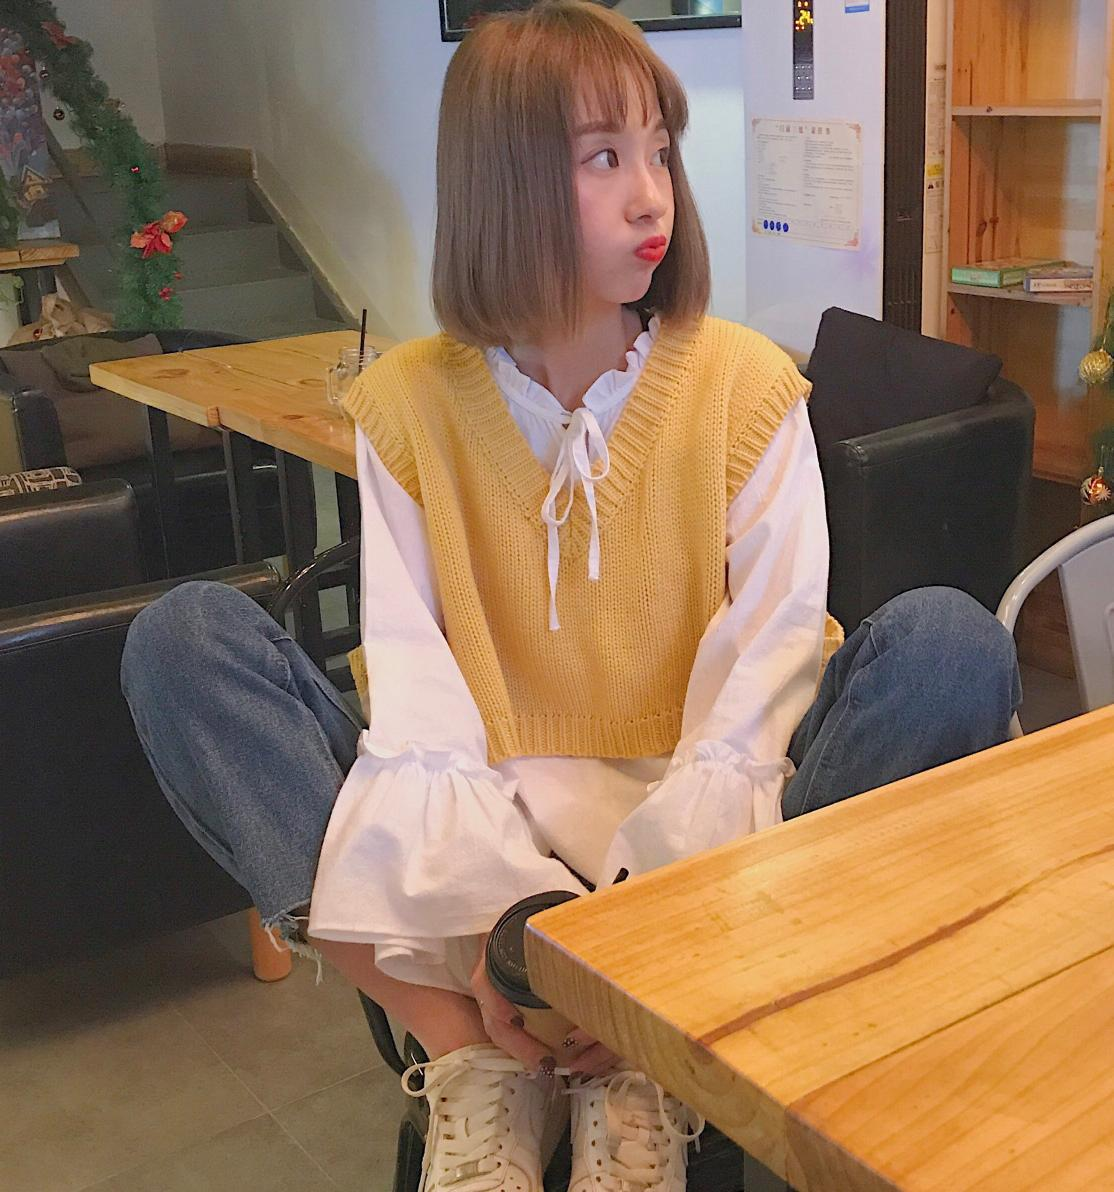 2019 Spring Photo Shoot Early Autumn Bell Sleeve White Shirt + Short Vest Waistcoat Woolen Knit